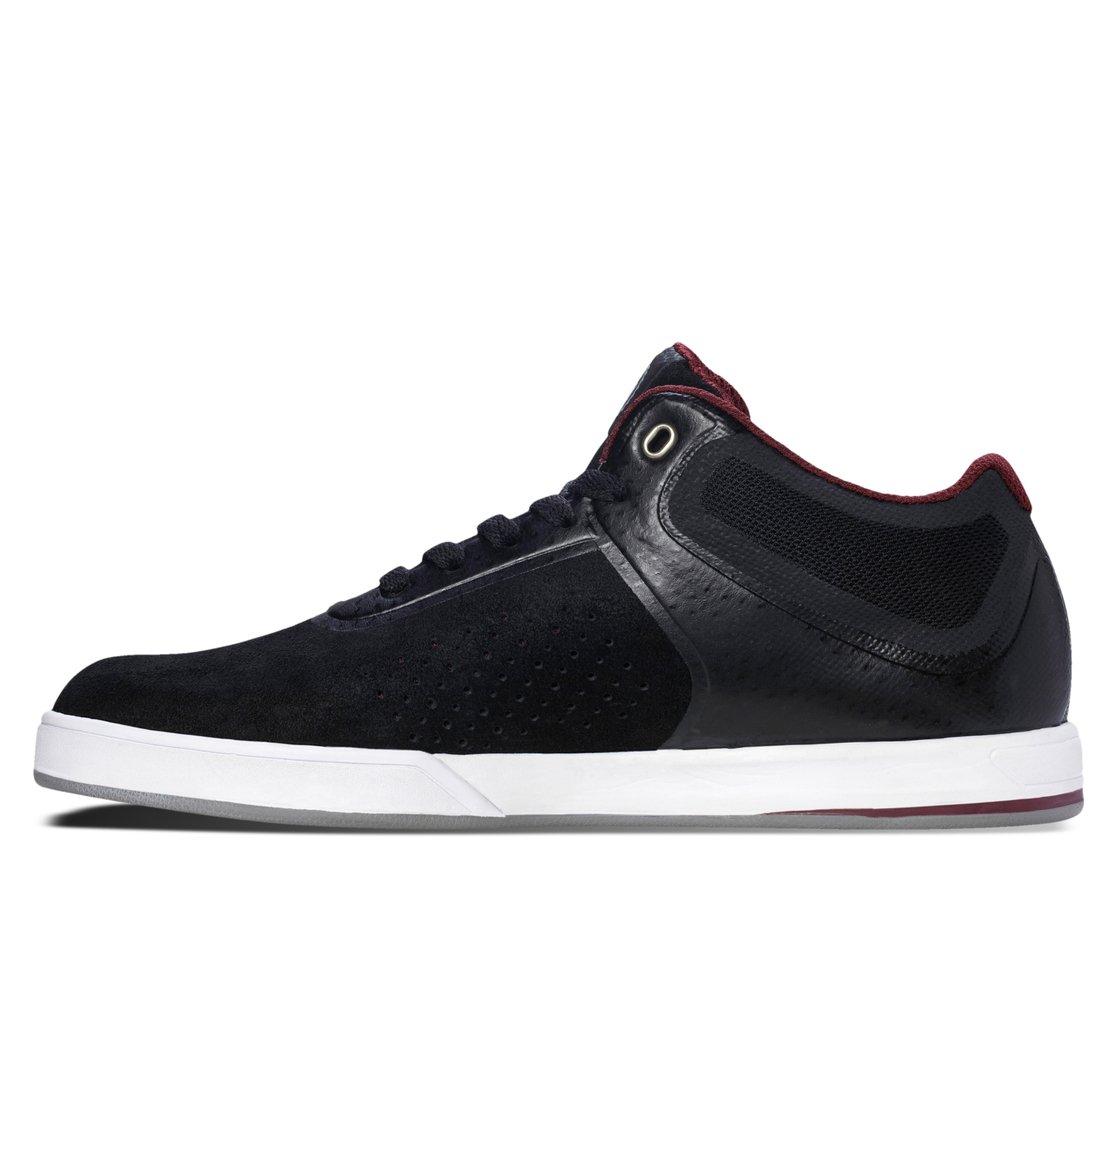 Mike Mo Capaldi Shoe Size